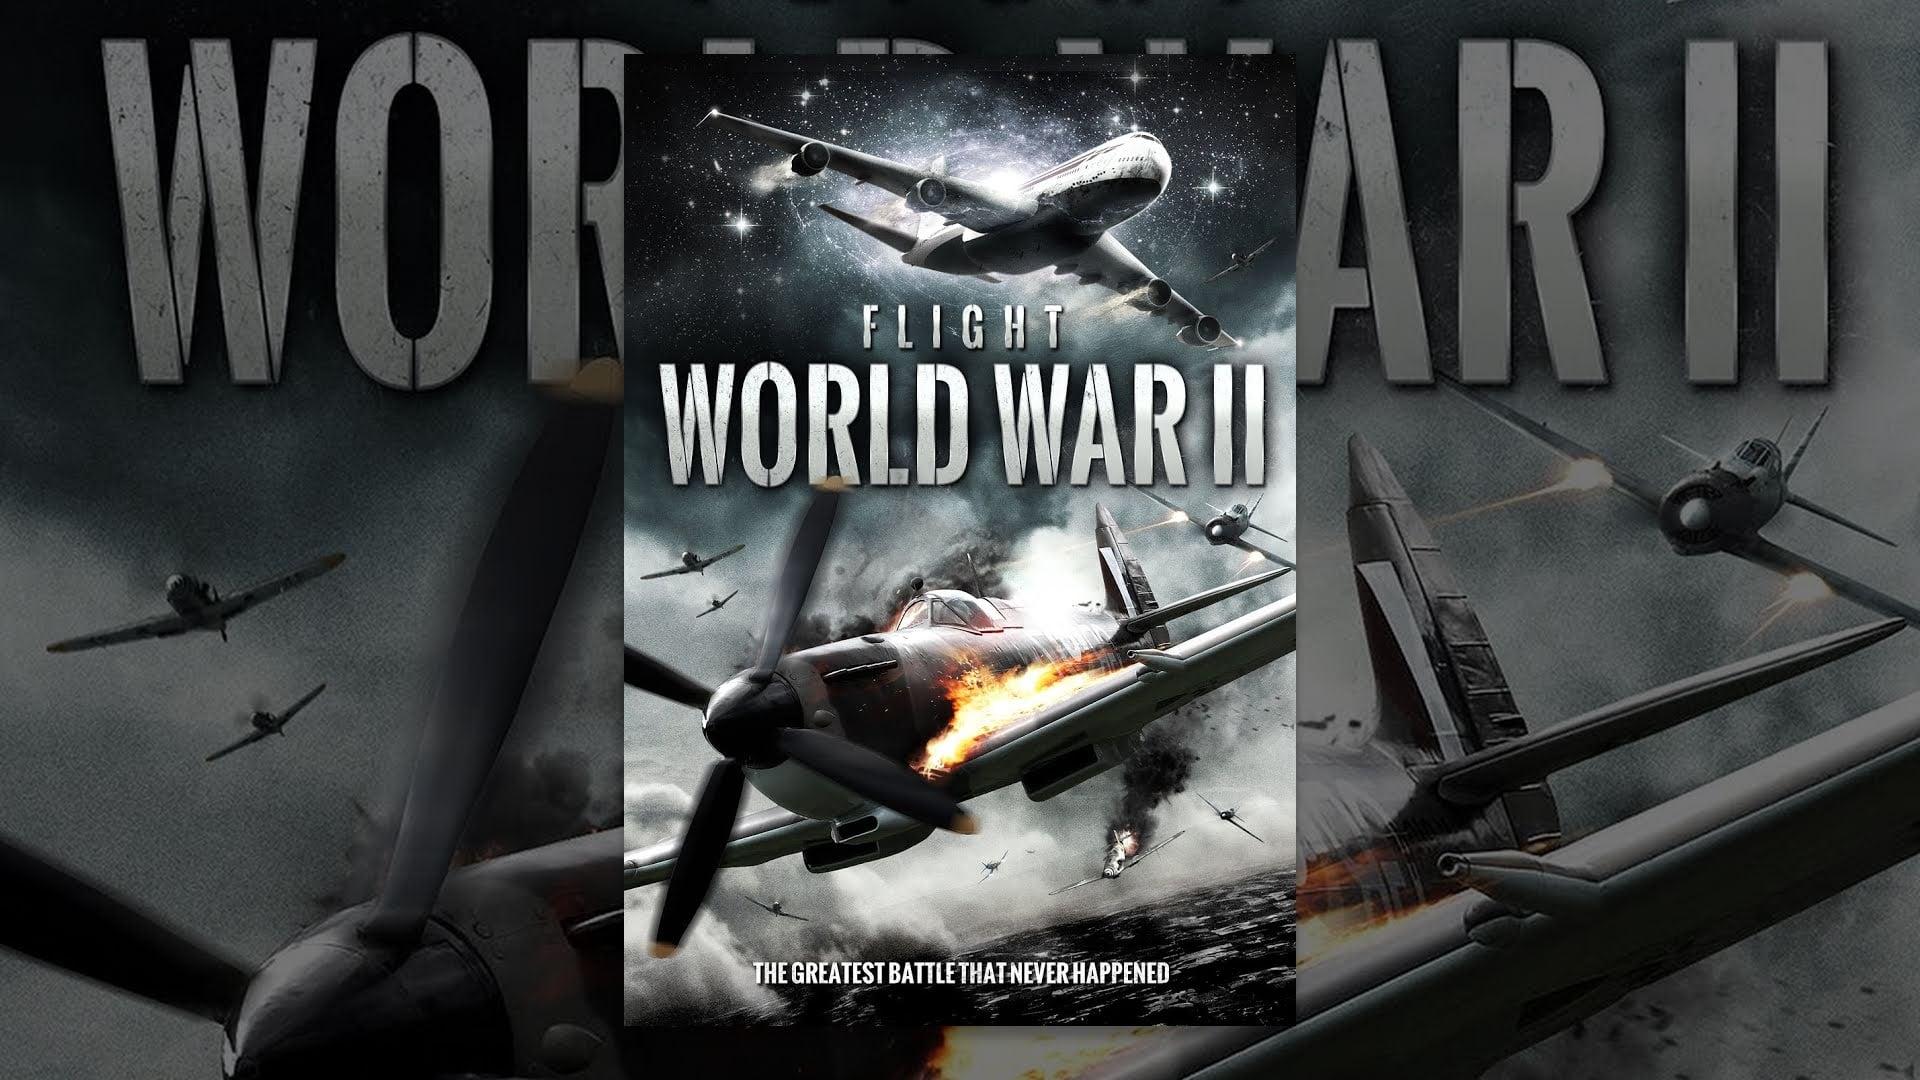 Flight World War II